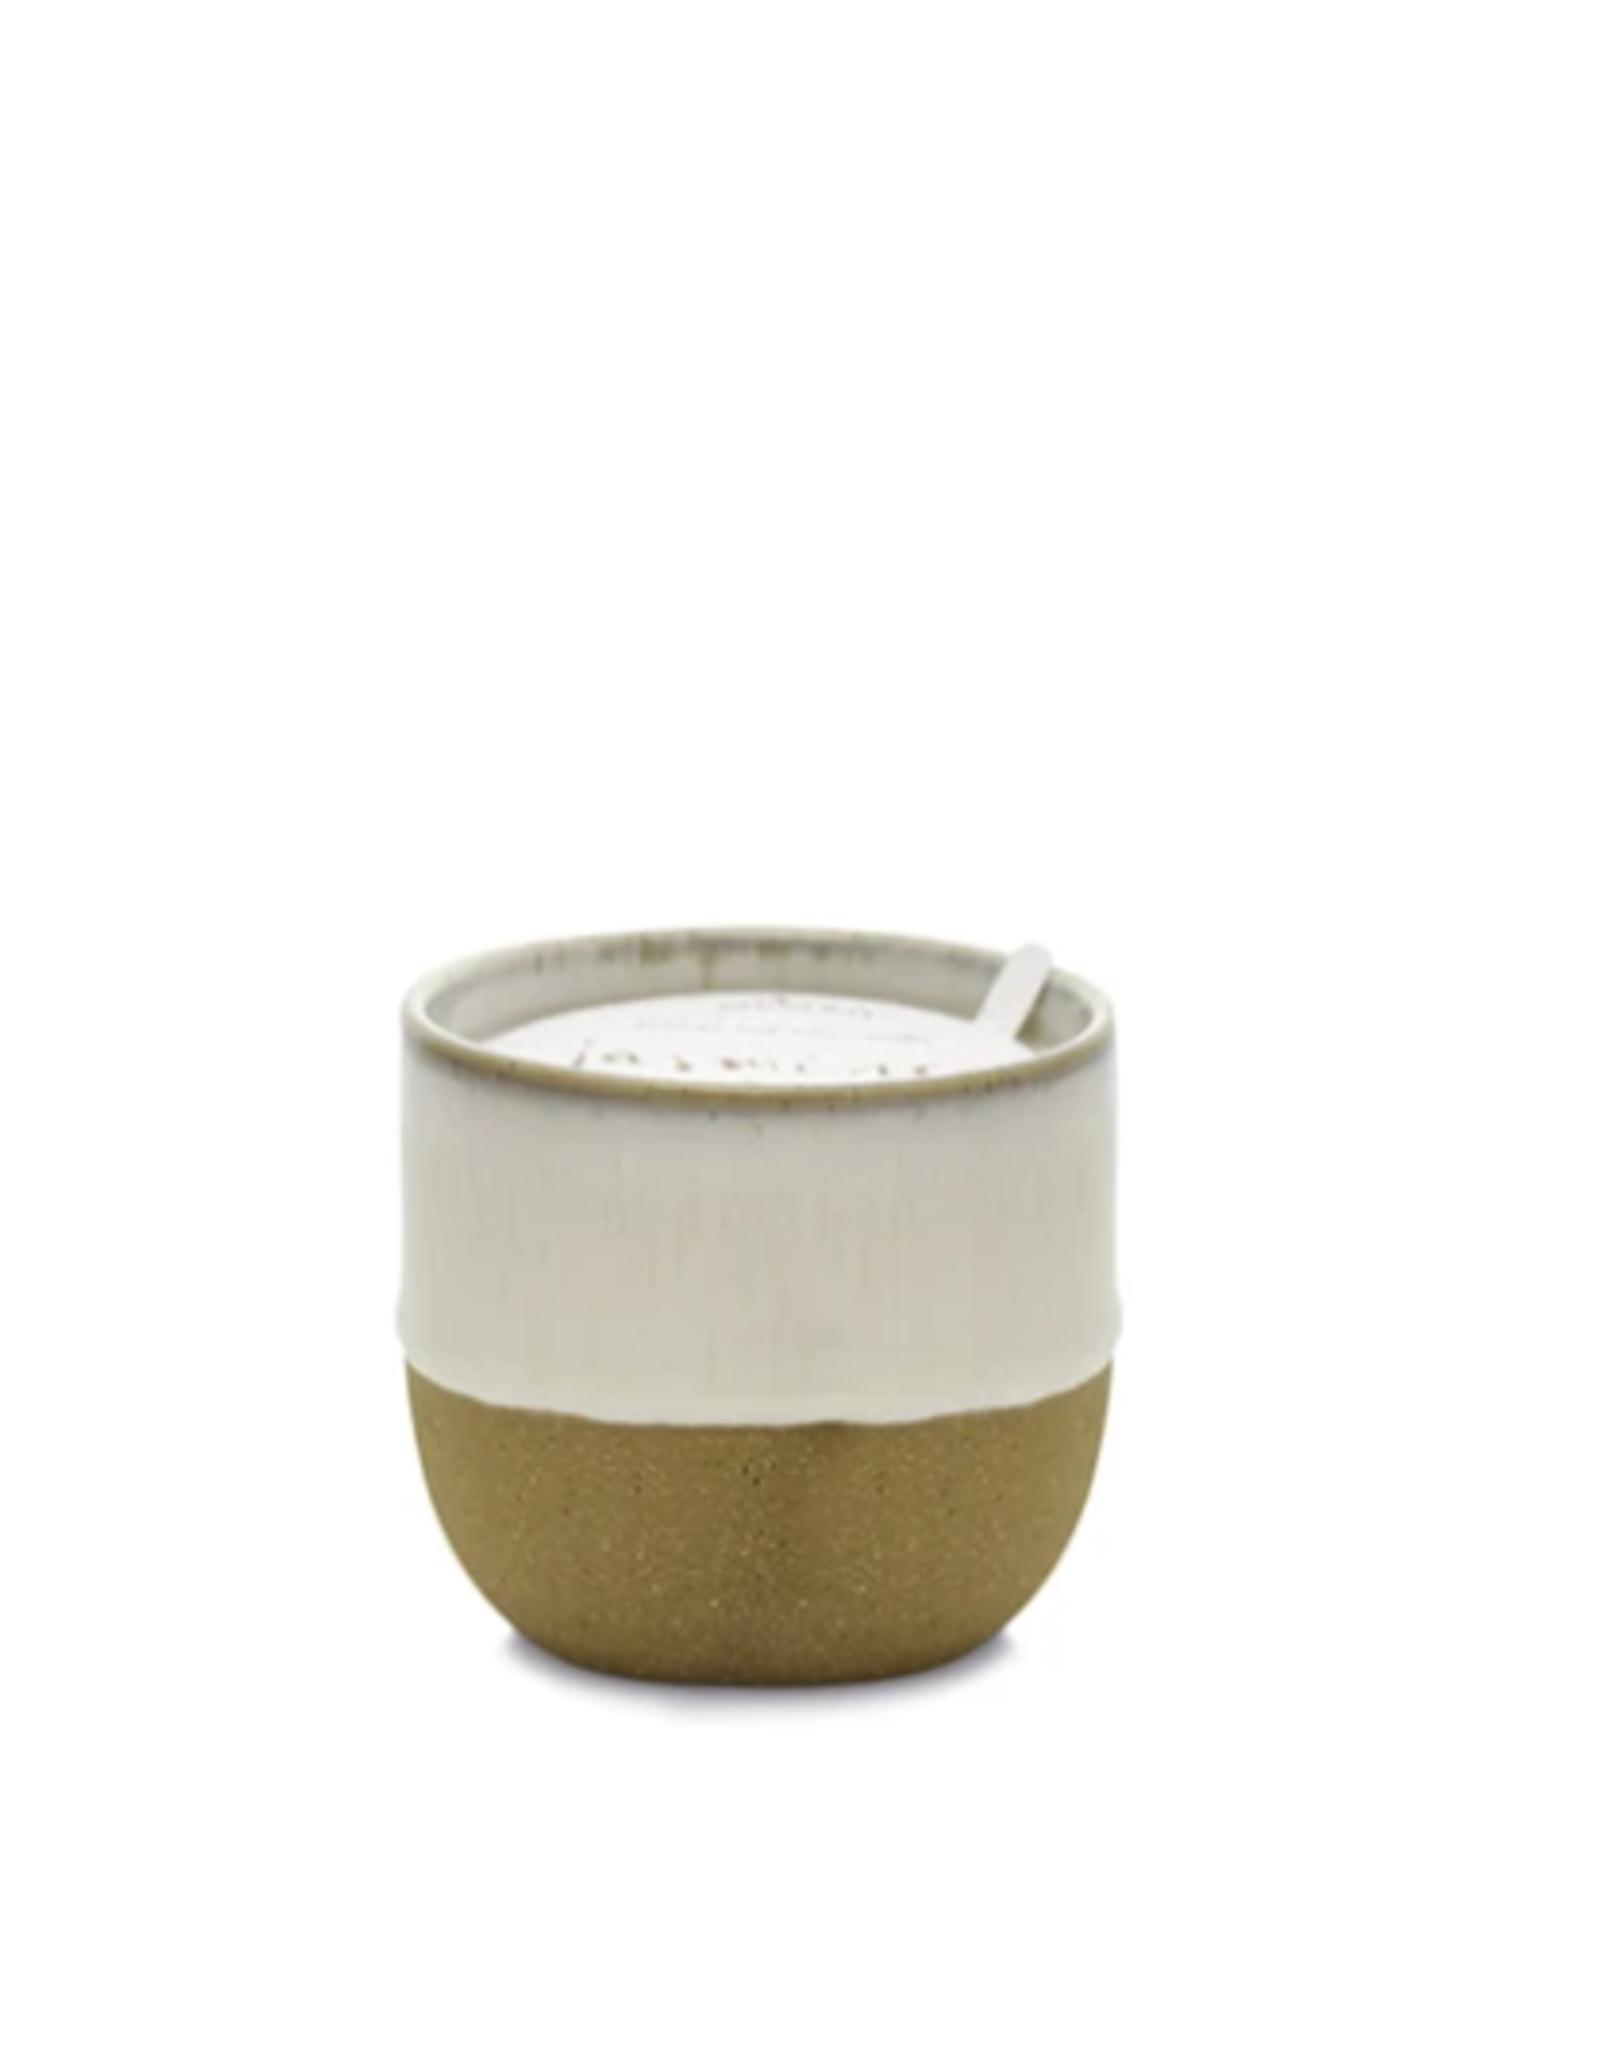 Kin Jasmine + Bamboo Candle